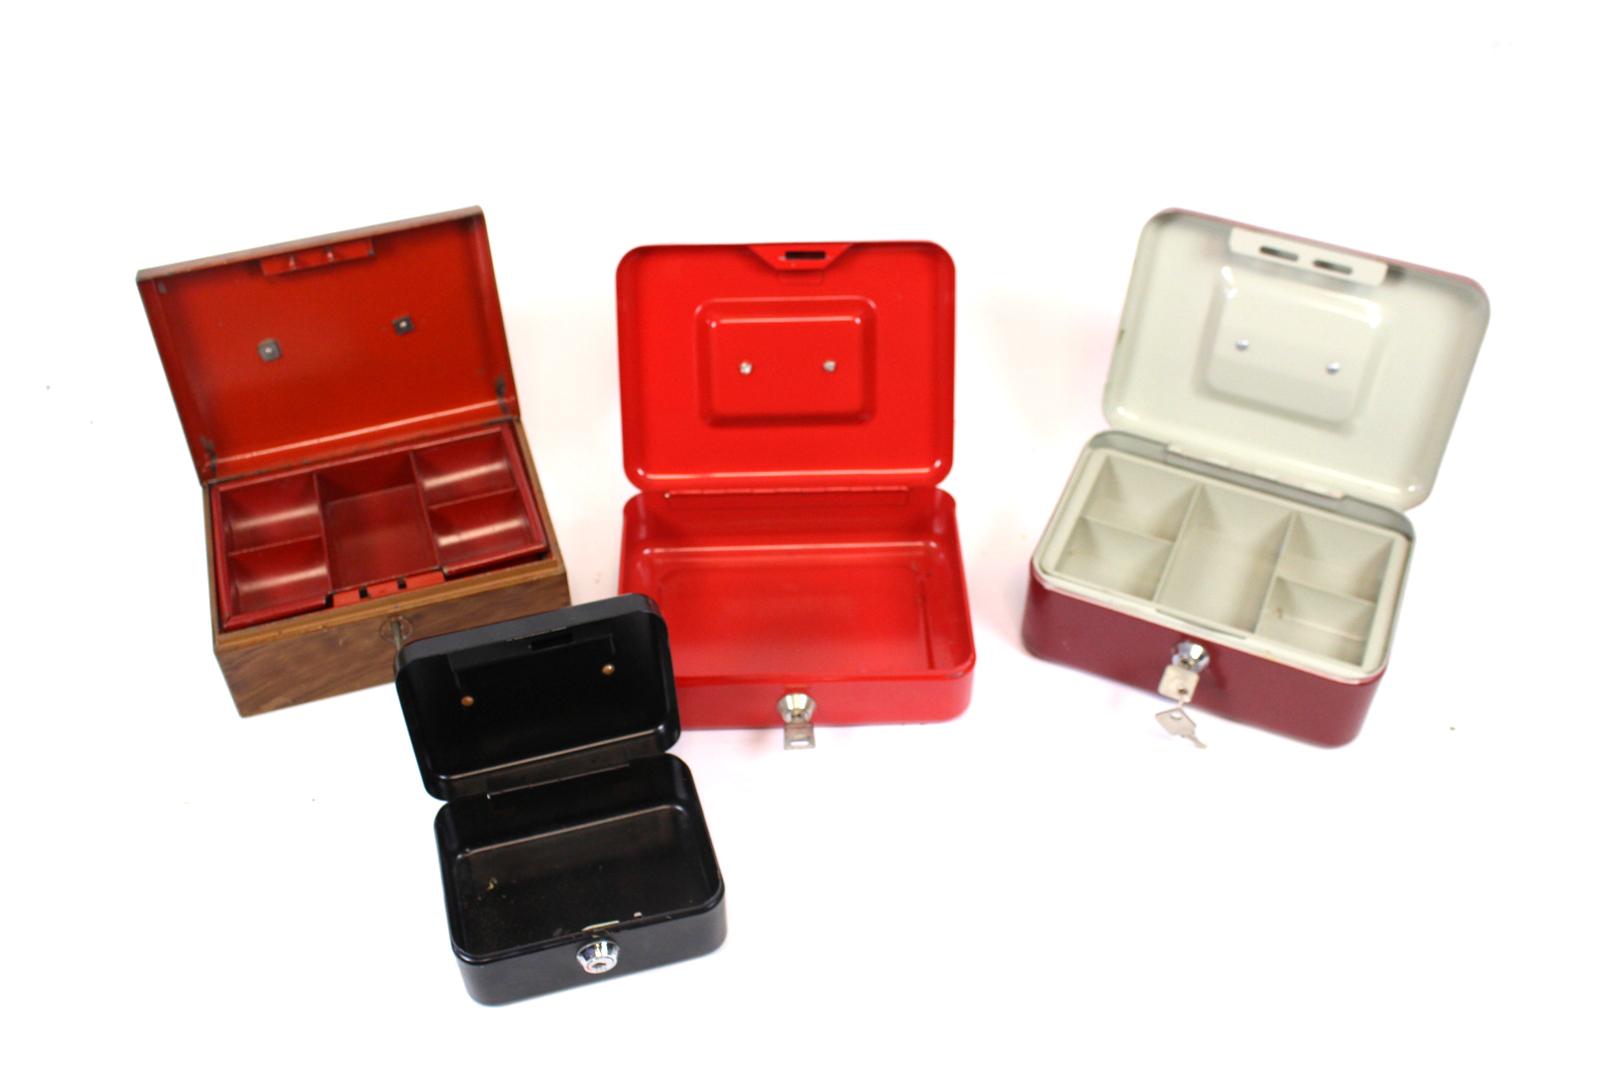 4 er set geld kassetten stahl metall m schl ssel rot braun alte kassette kasse ebay. Black Bedroom Furniture Sets. Home Design Ideas